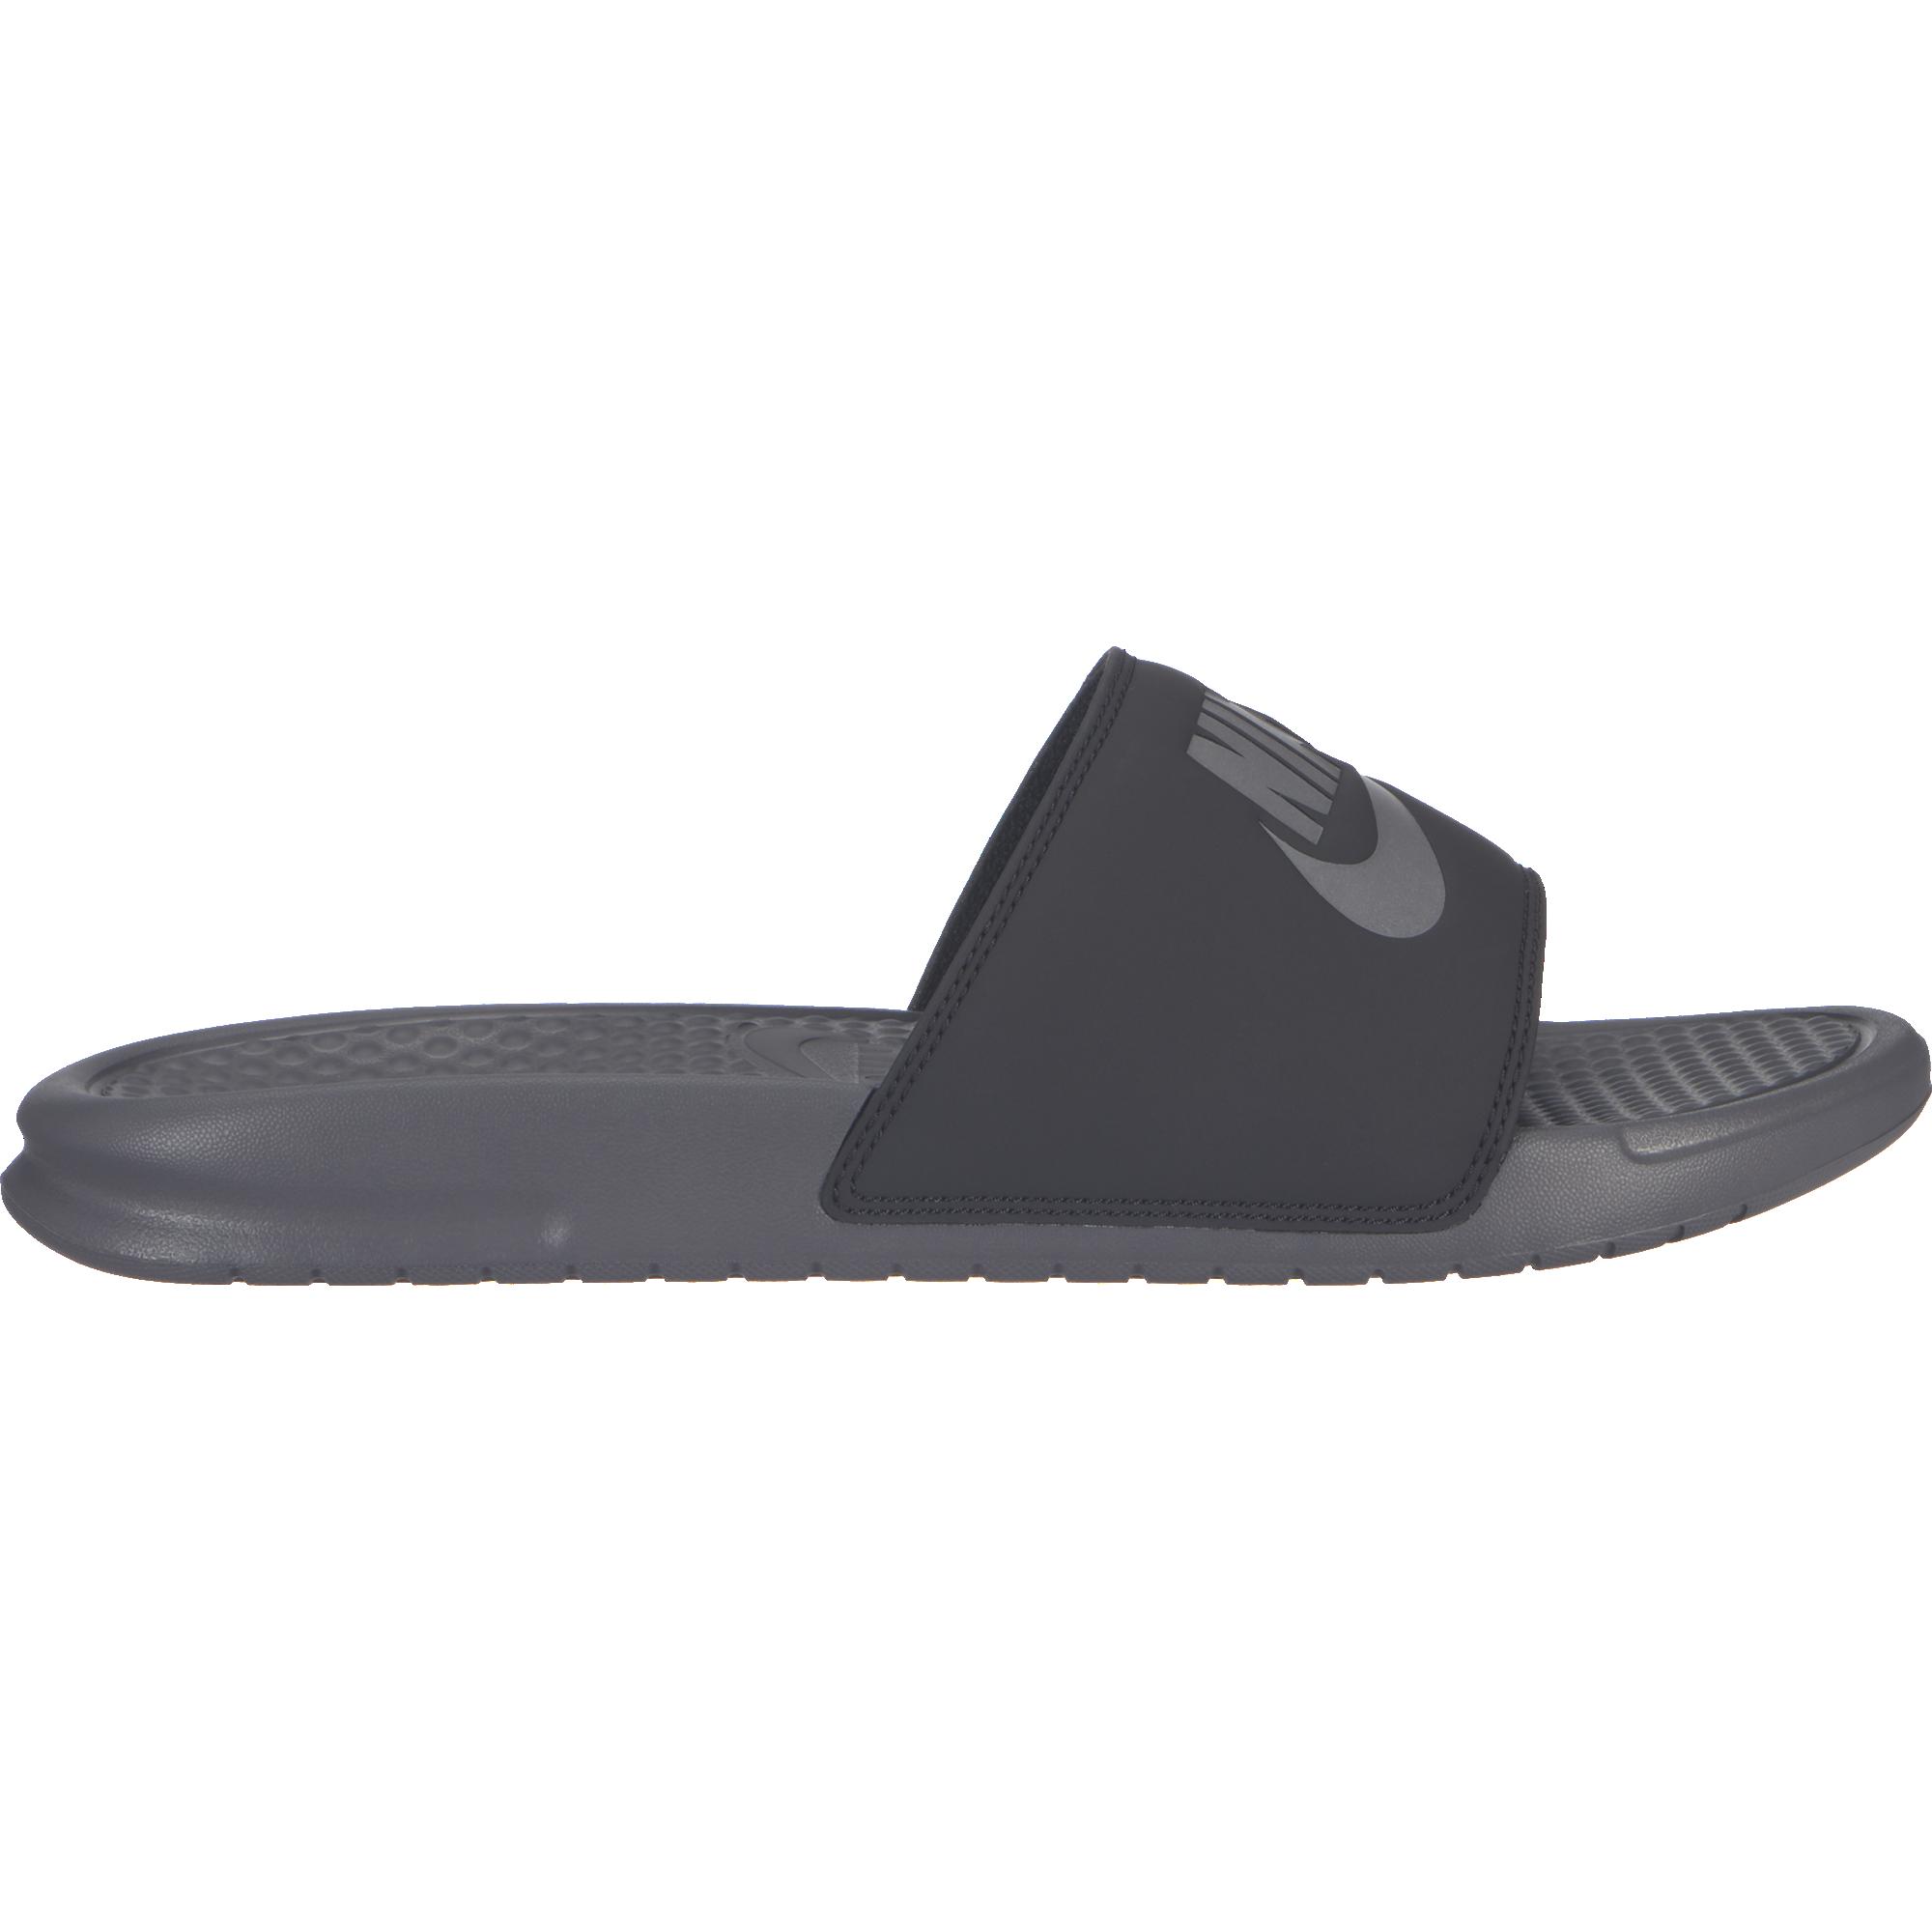 Benassi It' Gunsmokeoil Grey Nike 'just Sandal Do Slide b7yf6g